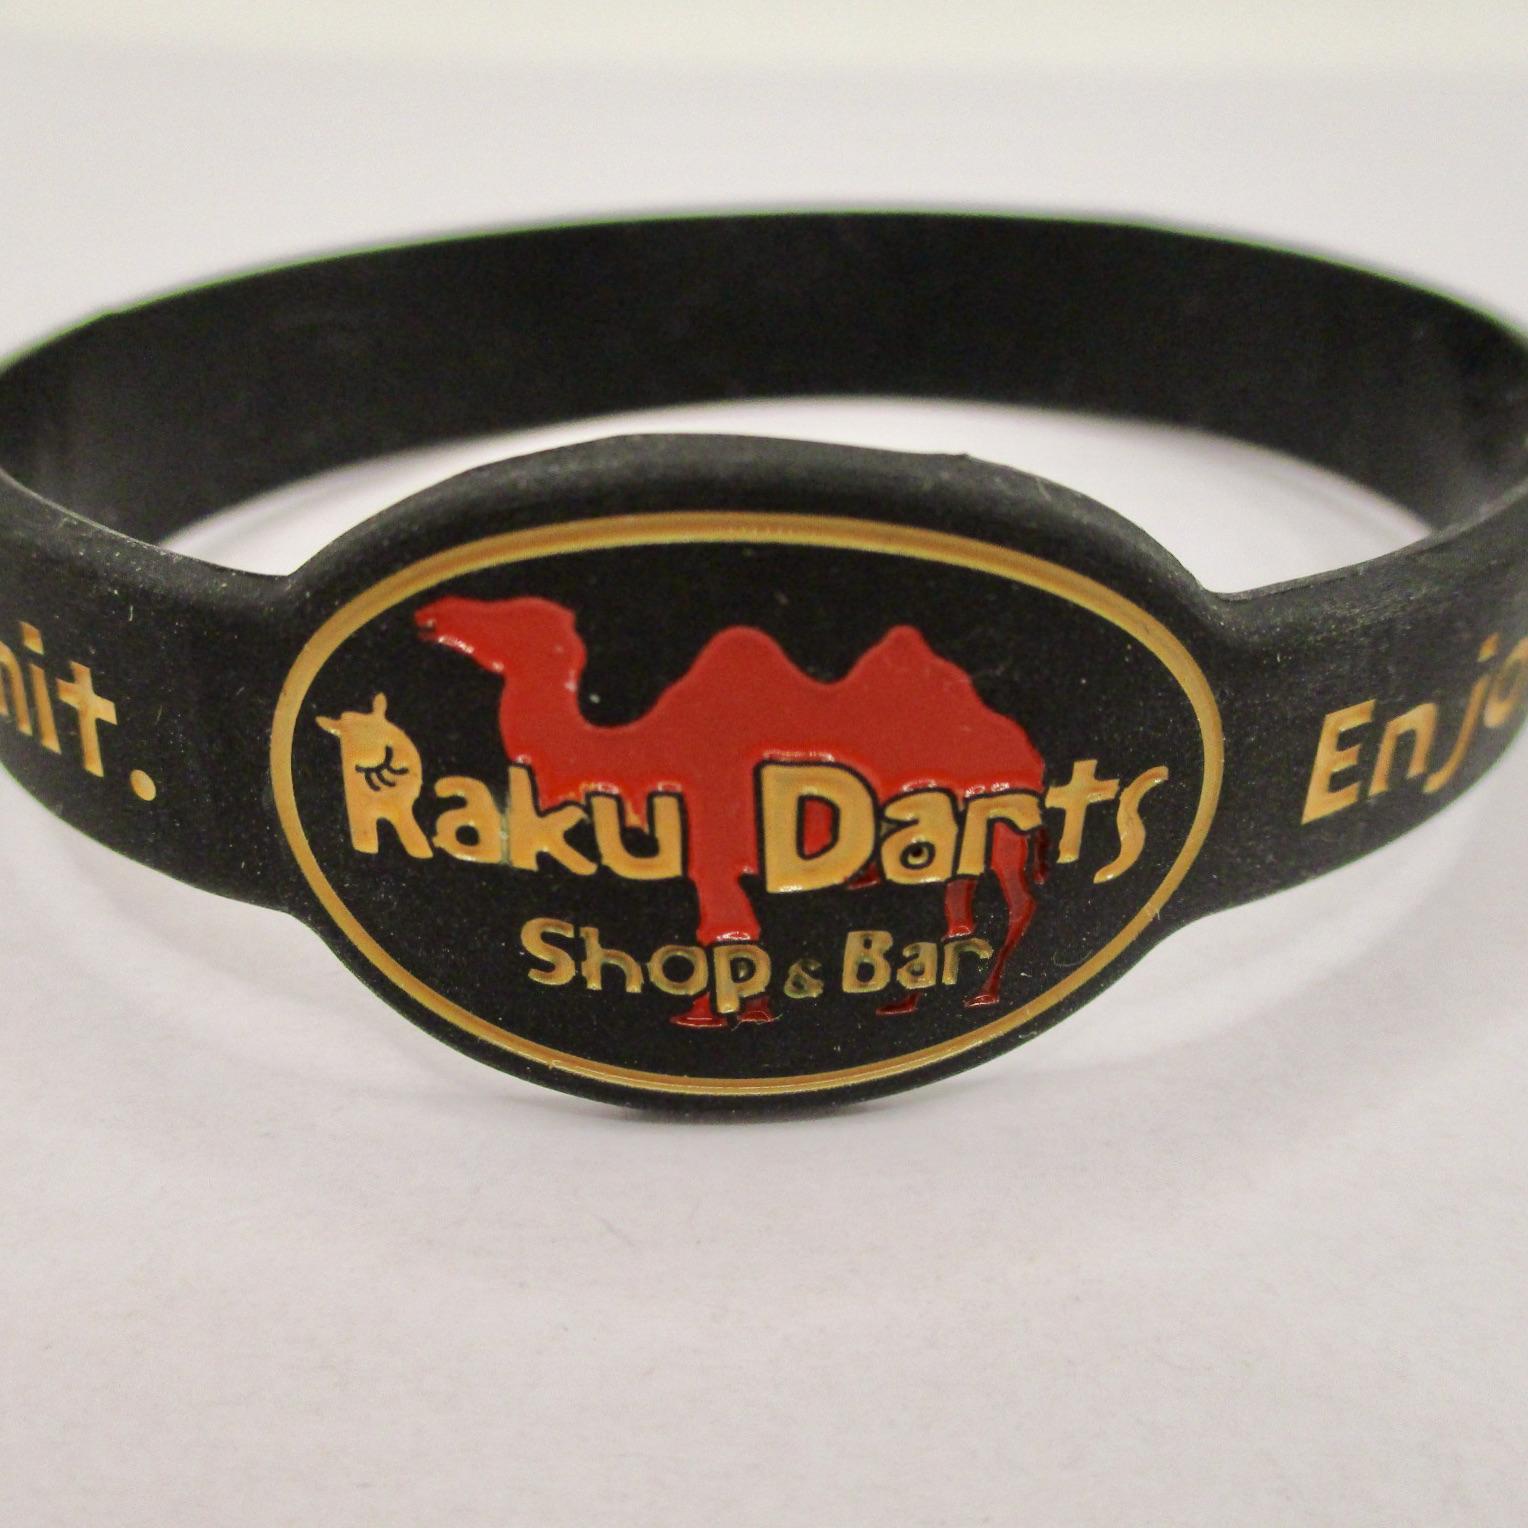 Raku Darts(ラクダーツ) [雑貨] オリジナル リストバンド 「Enjoy darts」